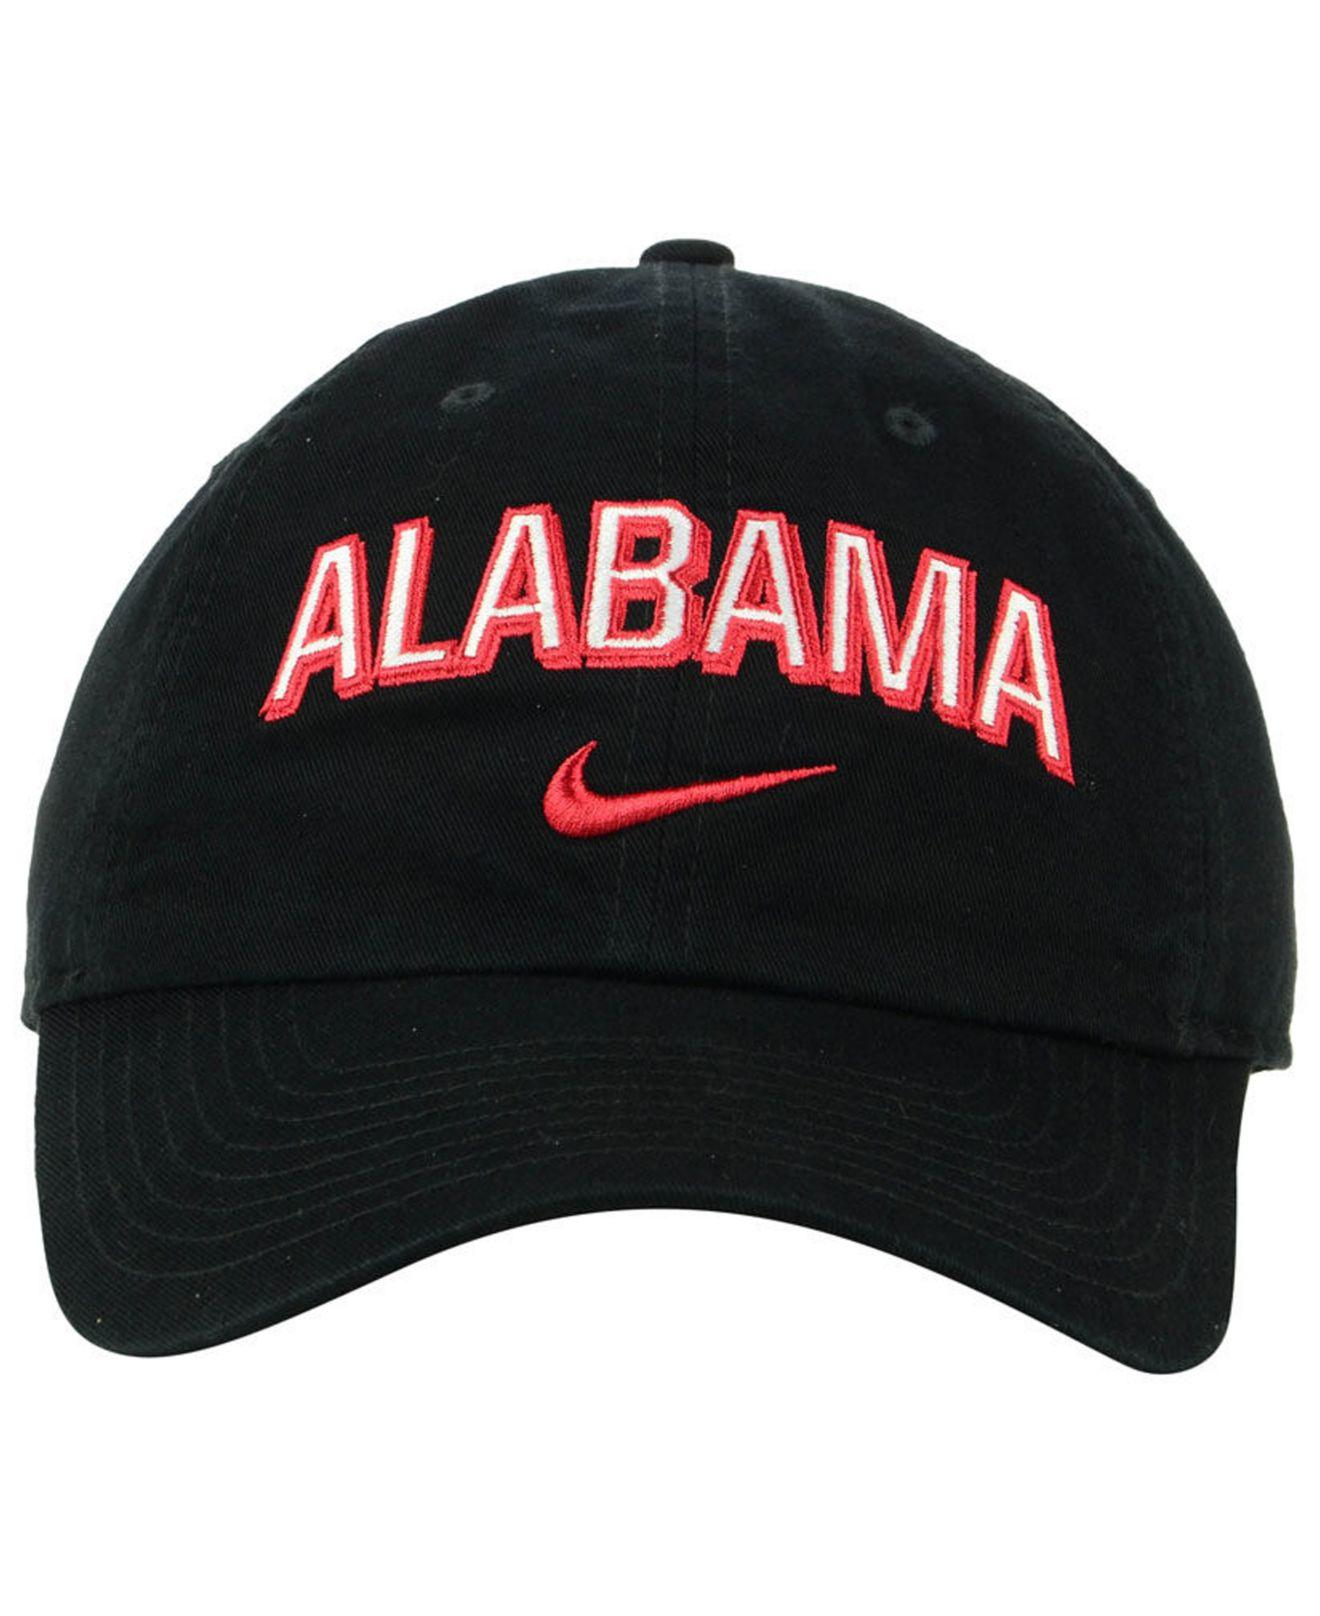 new products 5e334 89f77 Lyst - Nike Alabama Crimson Tide H86 Wordmark Swoosh Cap in Black for Men